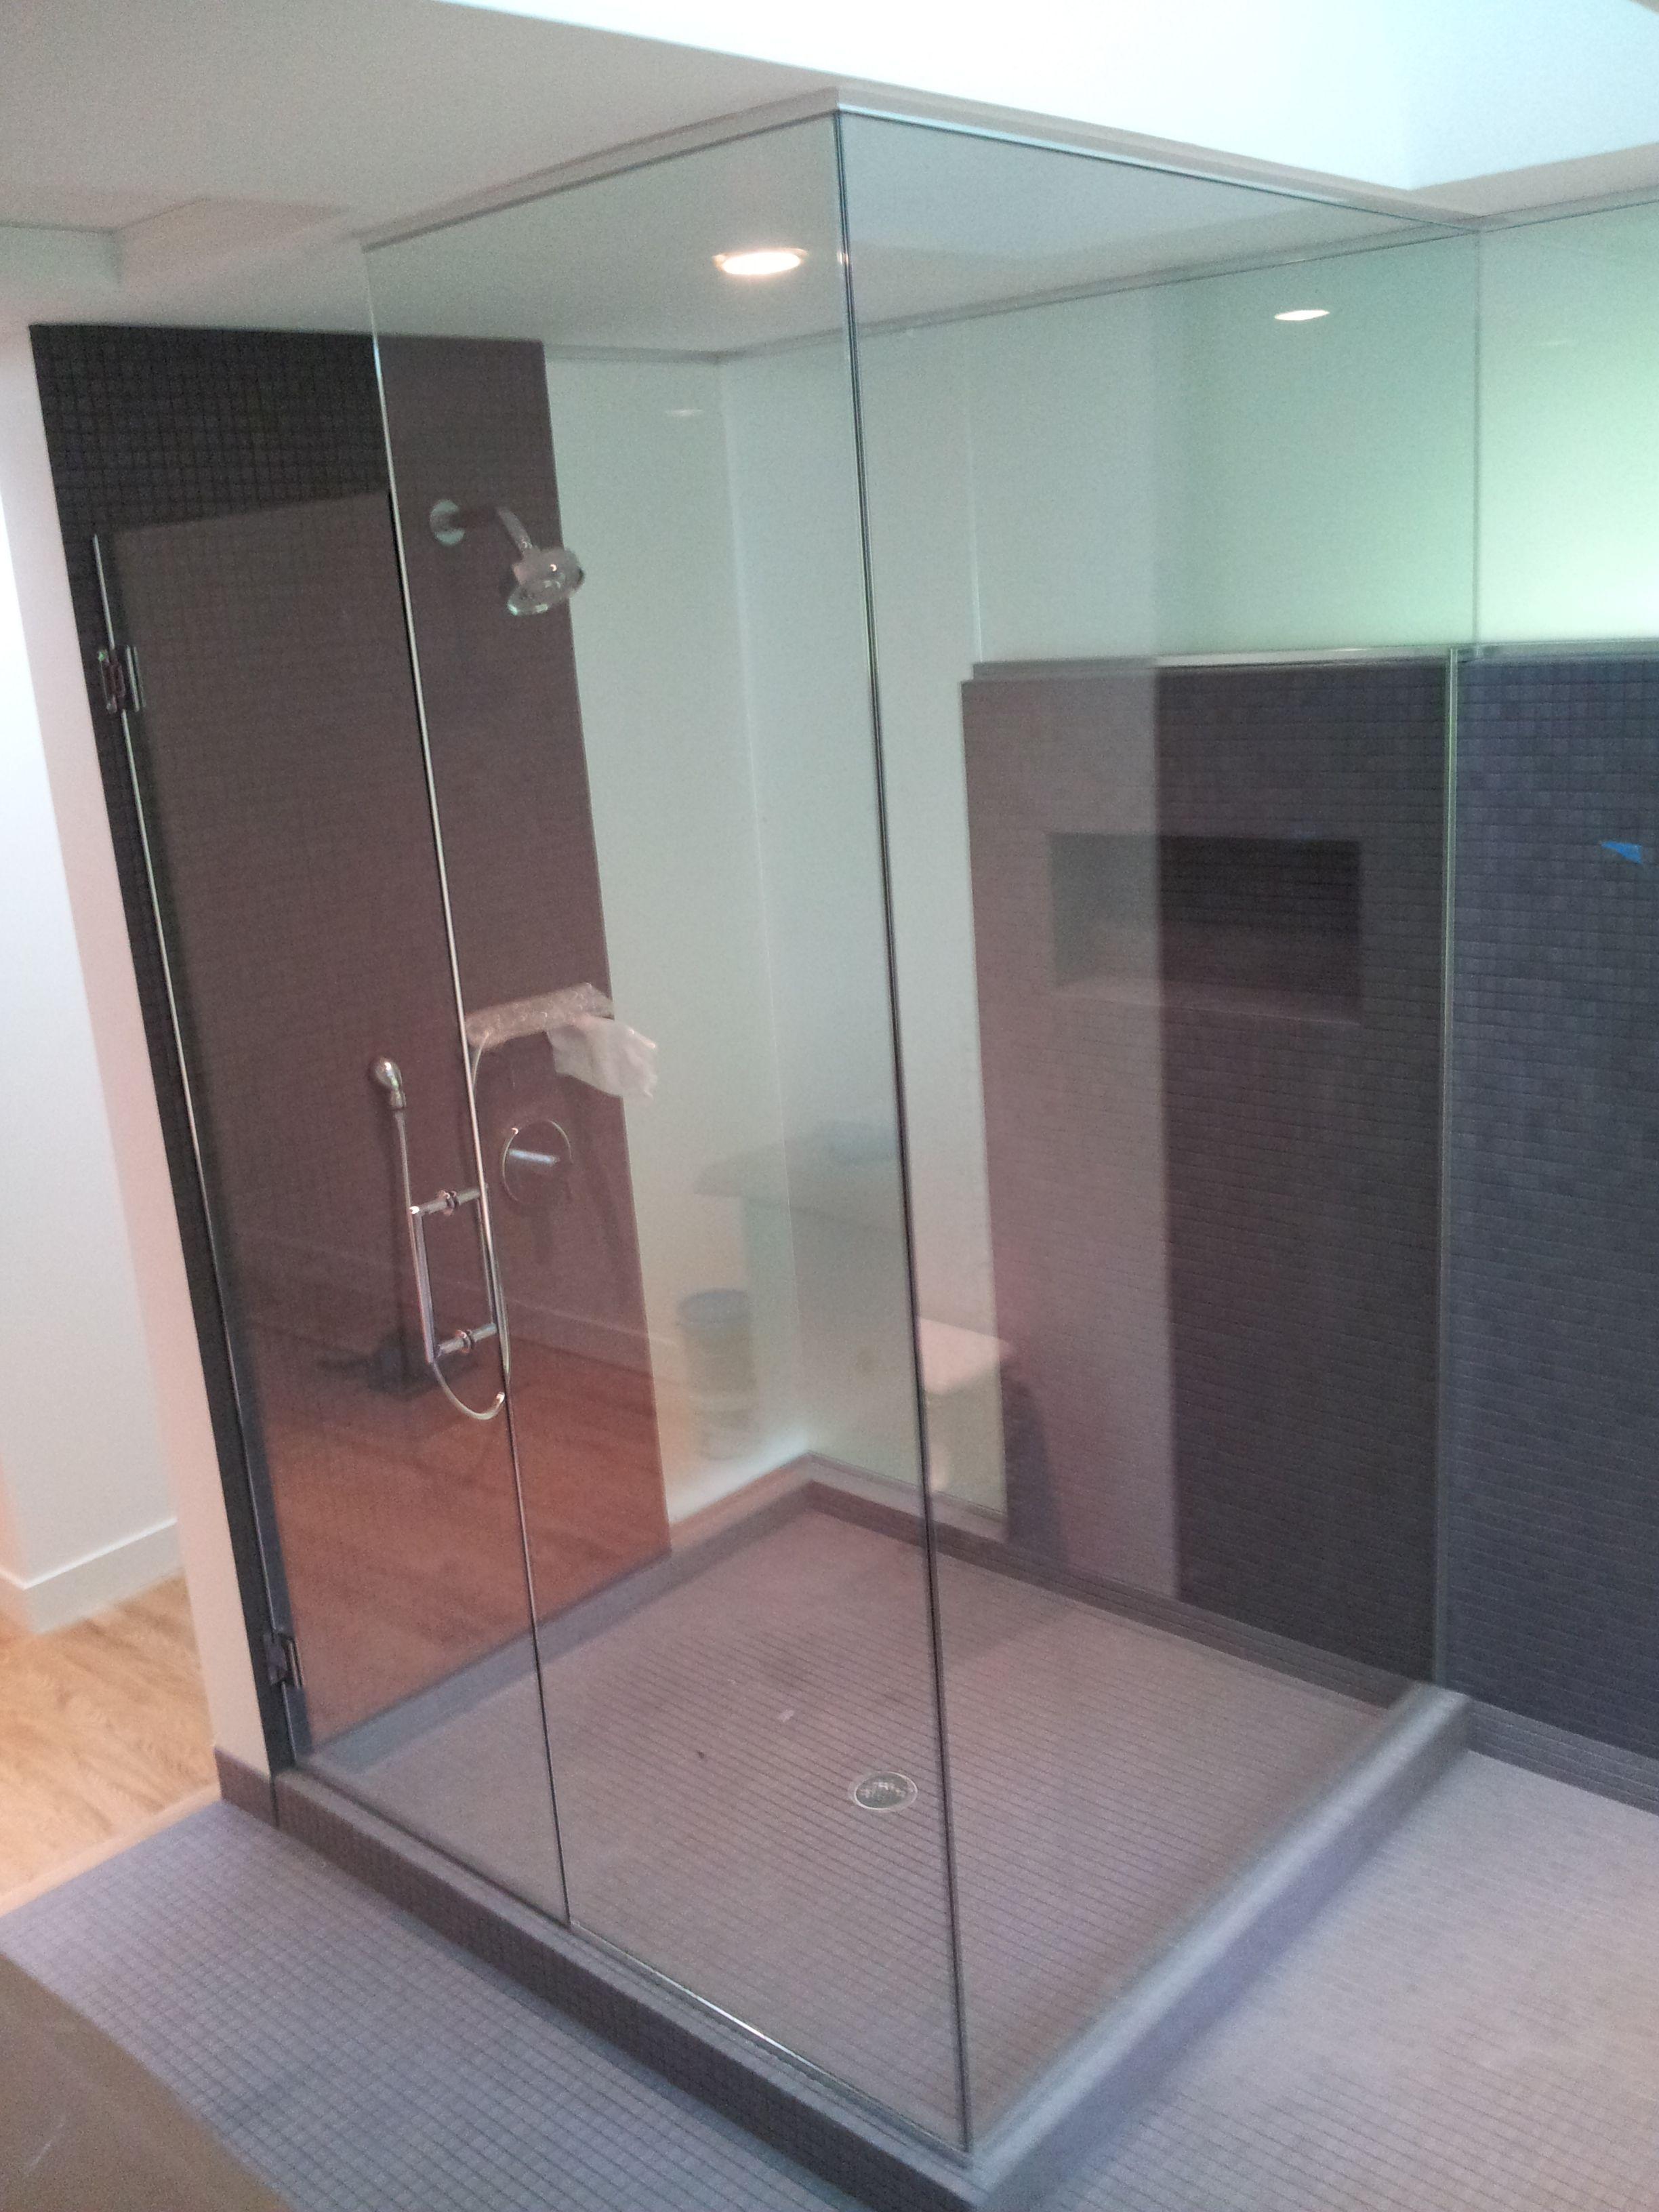 2 Sided Shower Enclosure Frameless One Side Clear And One Side Frosted Frameless Shower Enclosures Shower Enclosure Custom Shower Doors